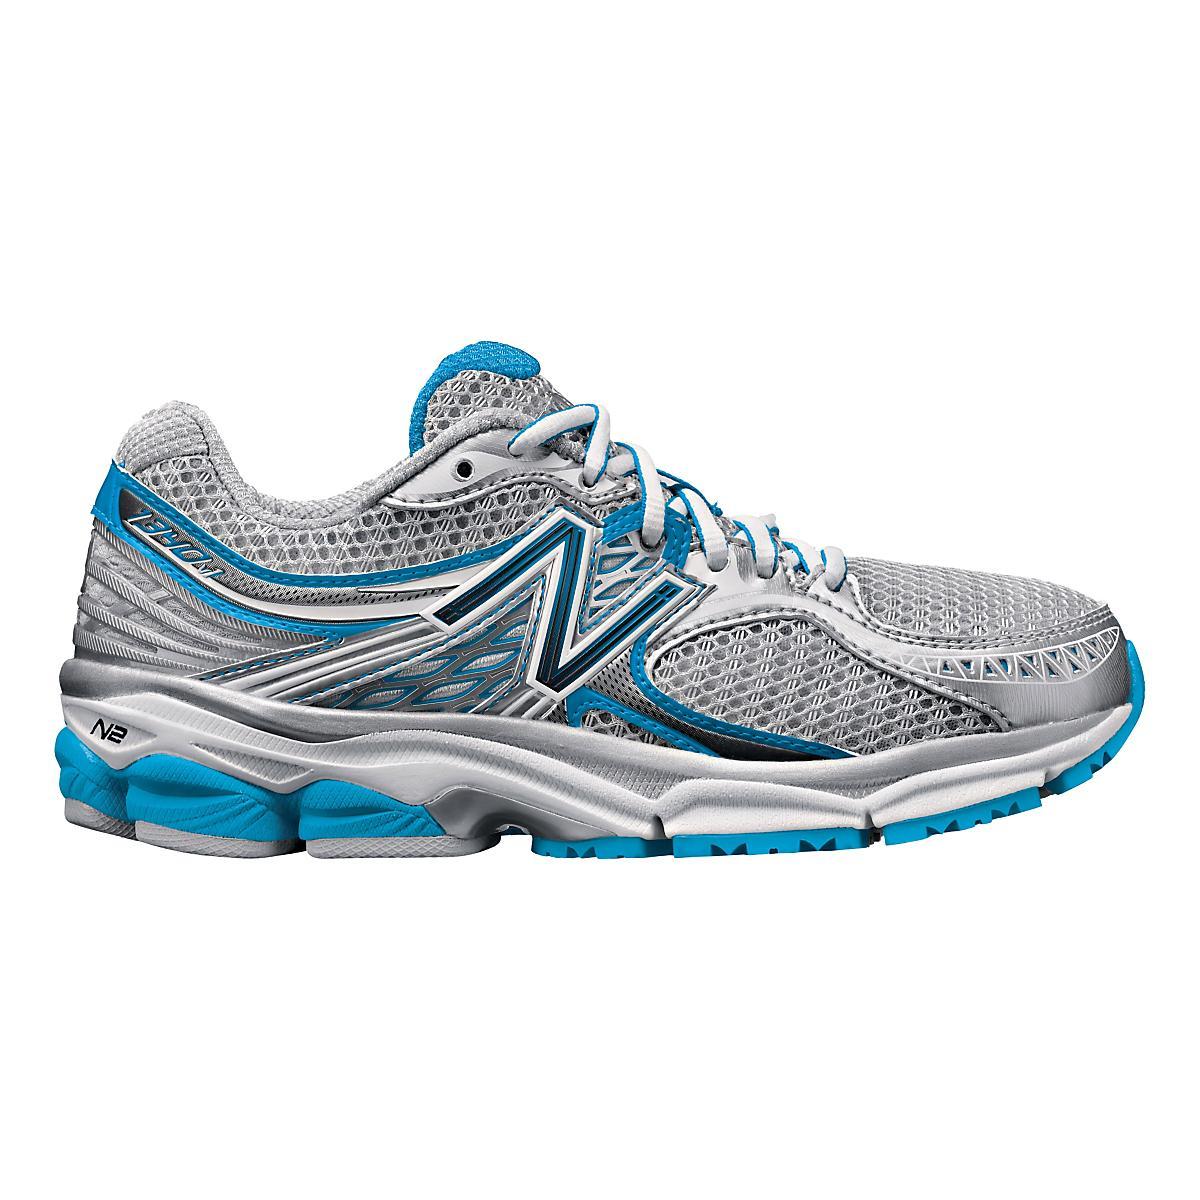 213f1819180f8 Womens New Balance 1340 Running Shoe at Road Runner Sports